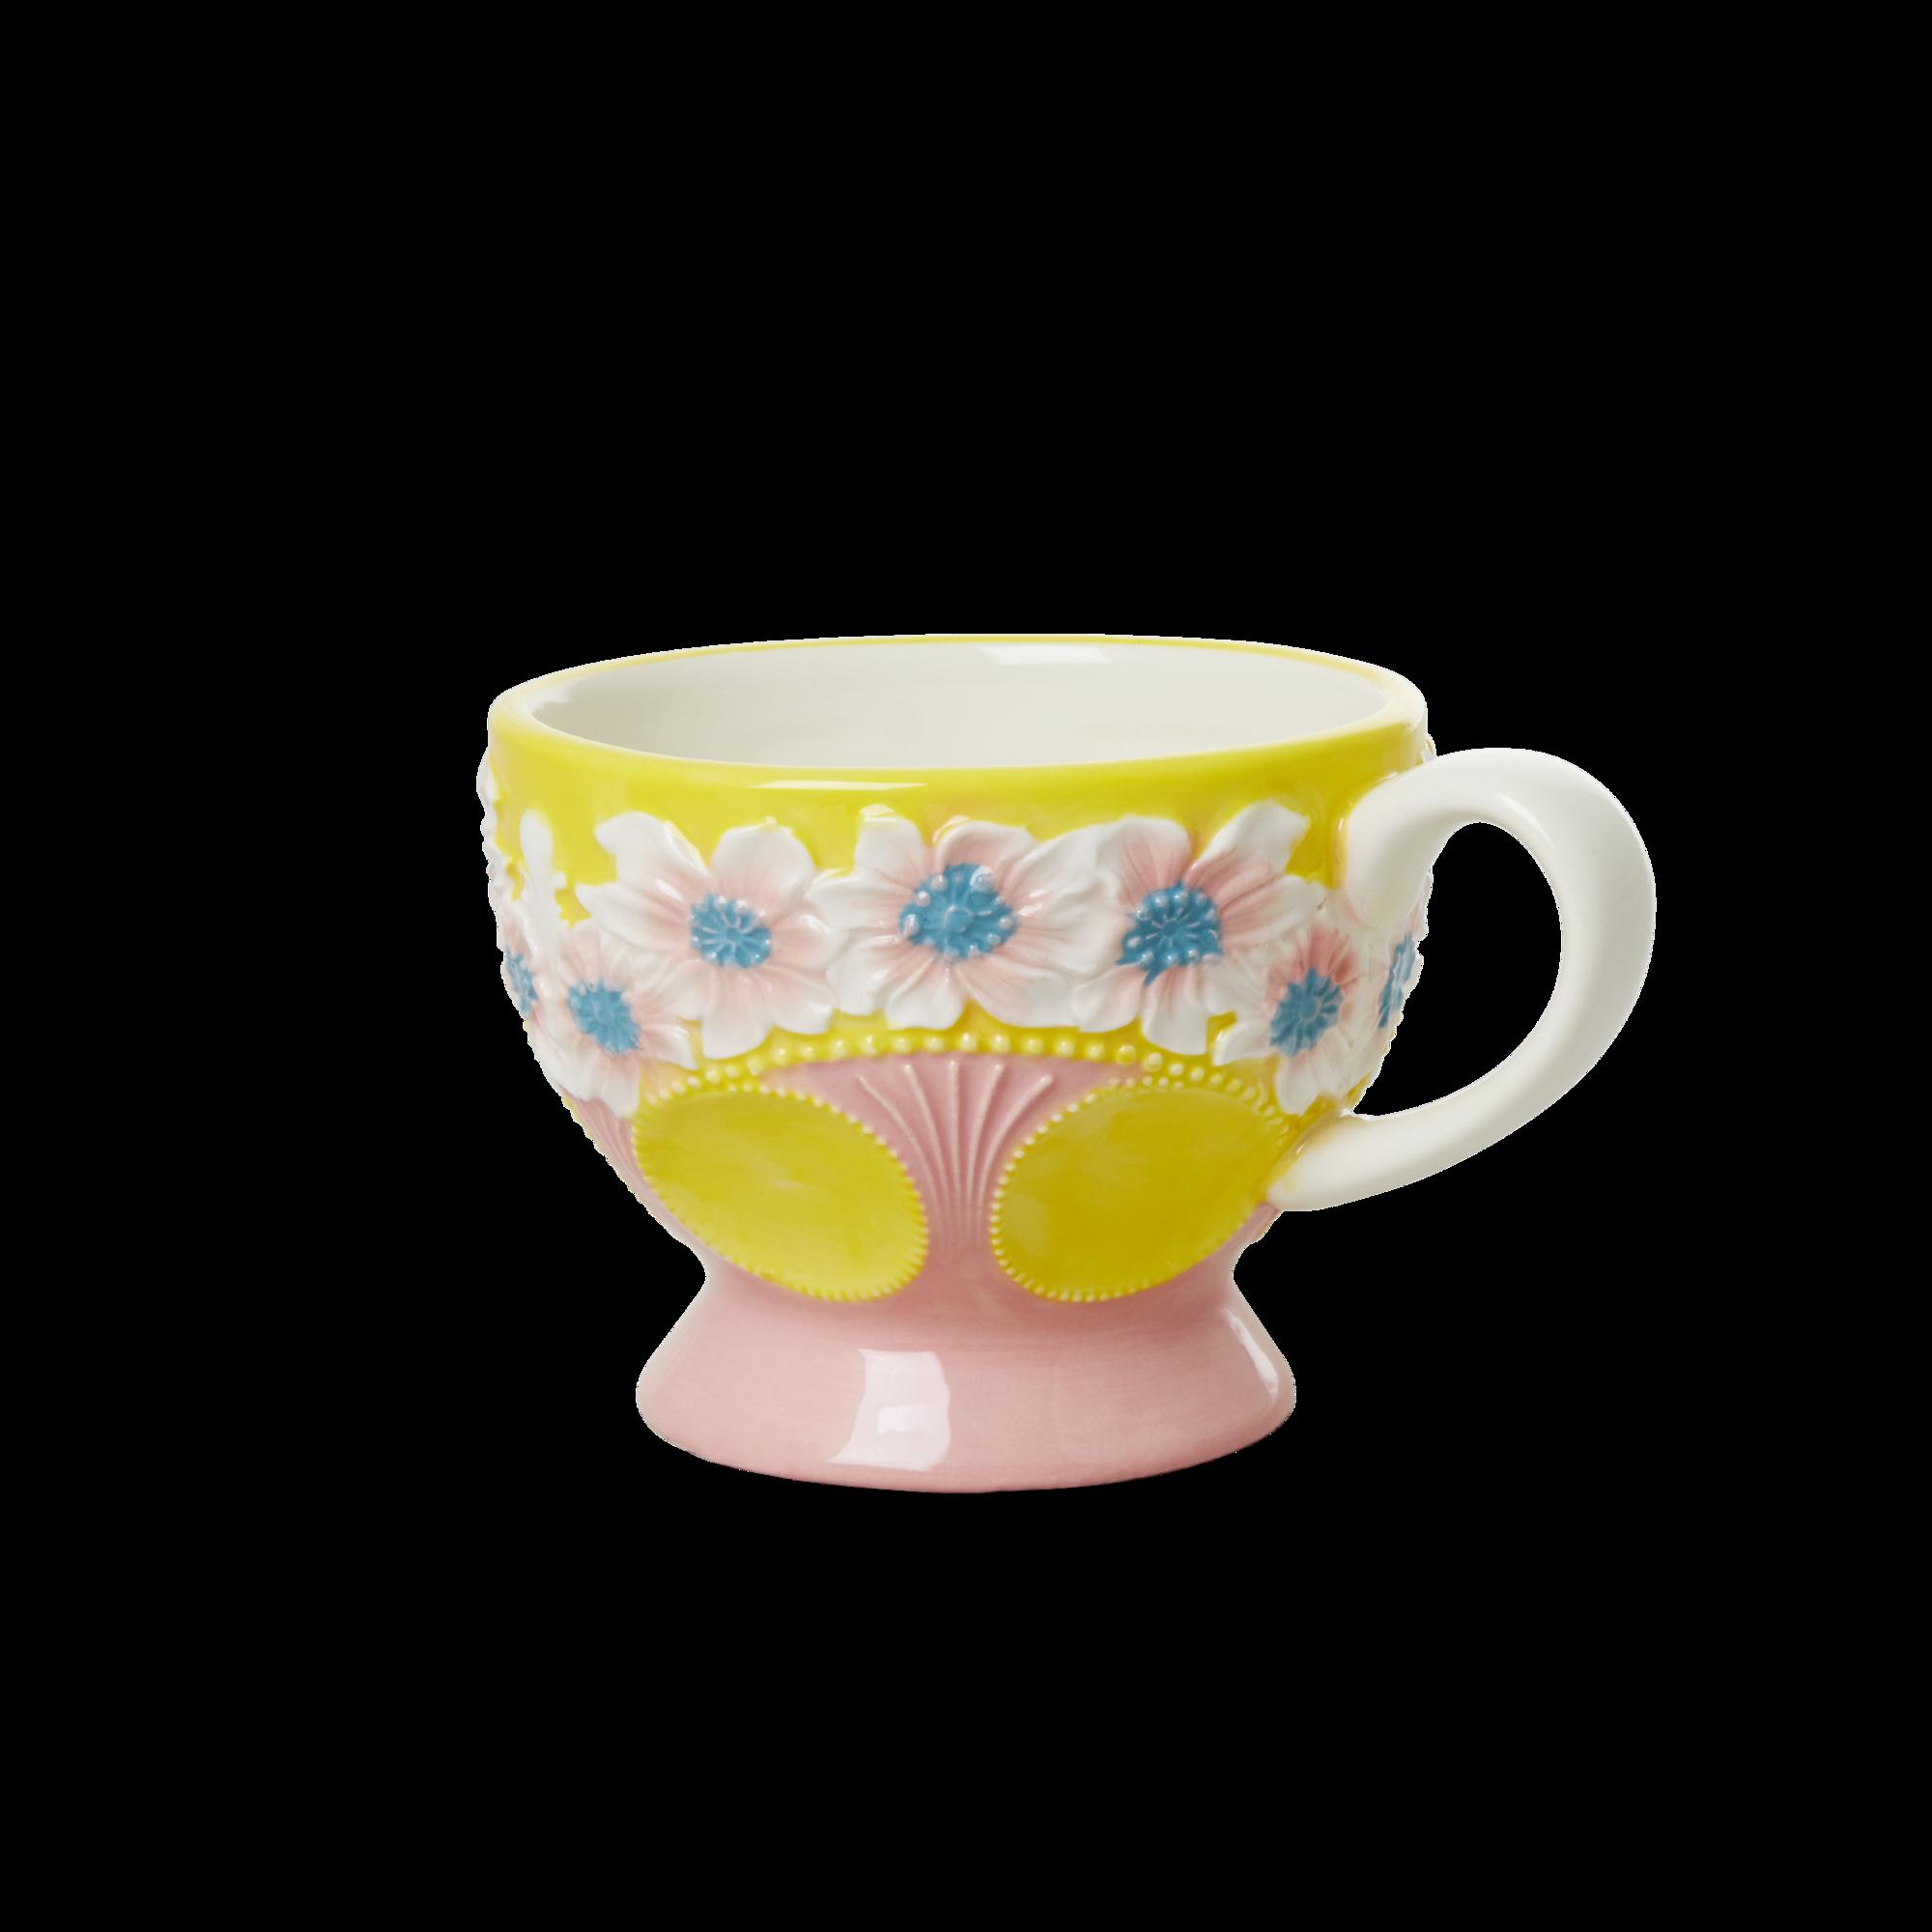 Rice - Ceramic Mug - Embossed Yellow Flower Design